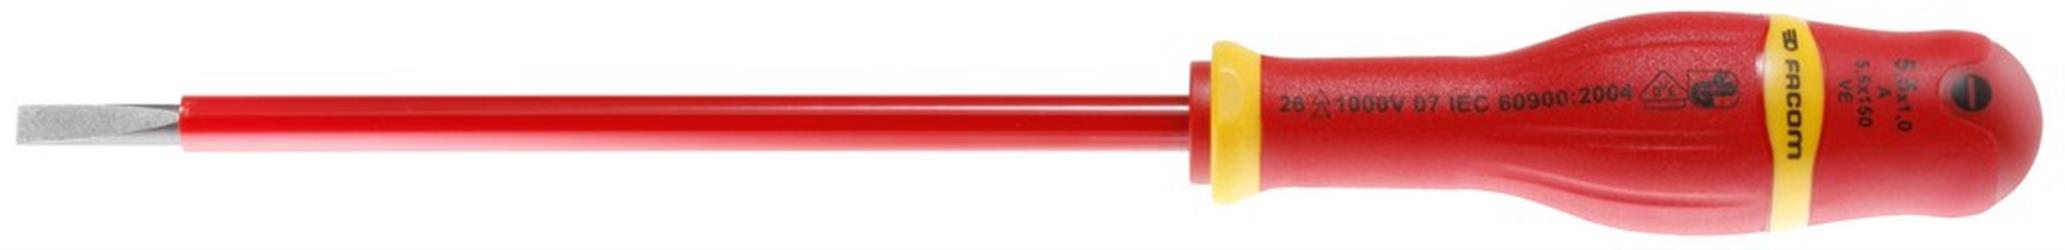 A.VE - Destornilladores PROTWIST® aislados 1.000 V